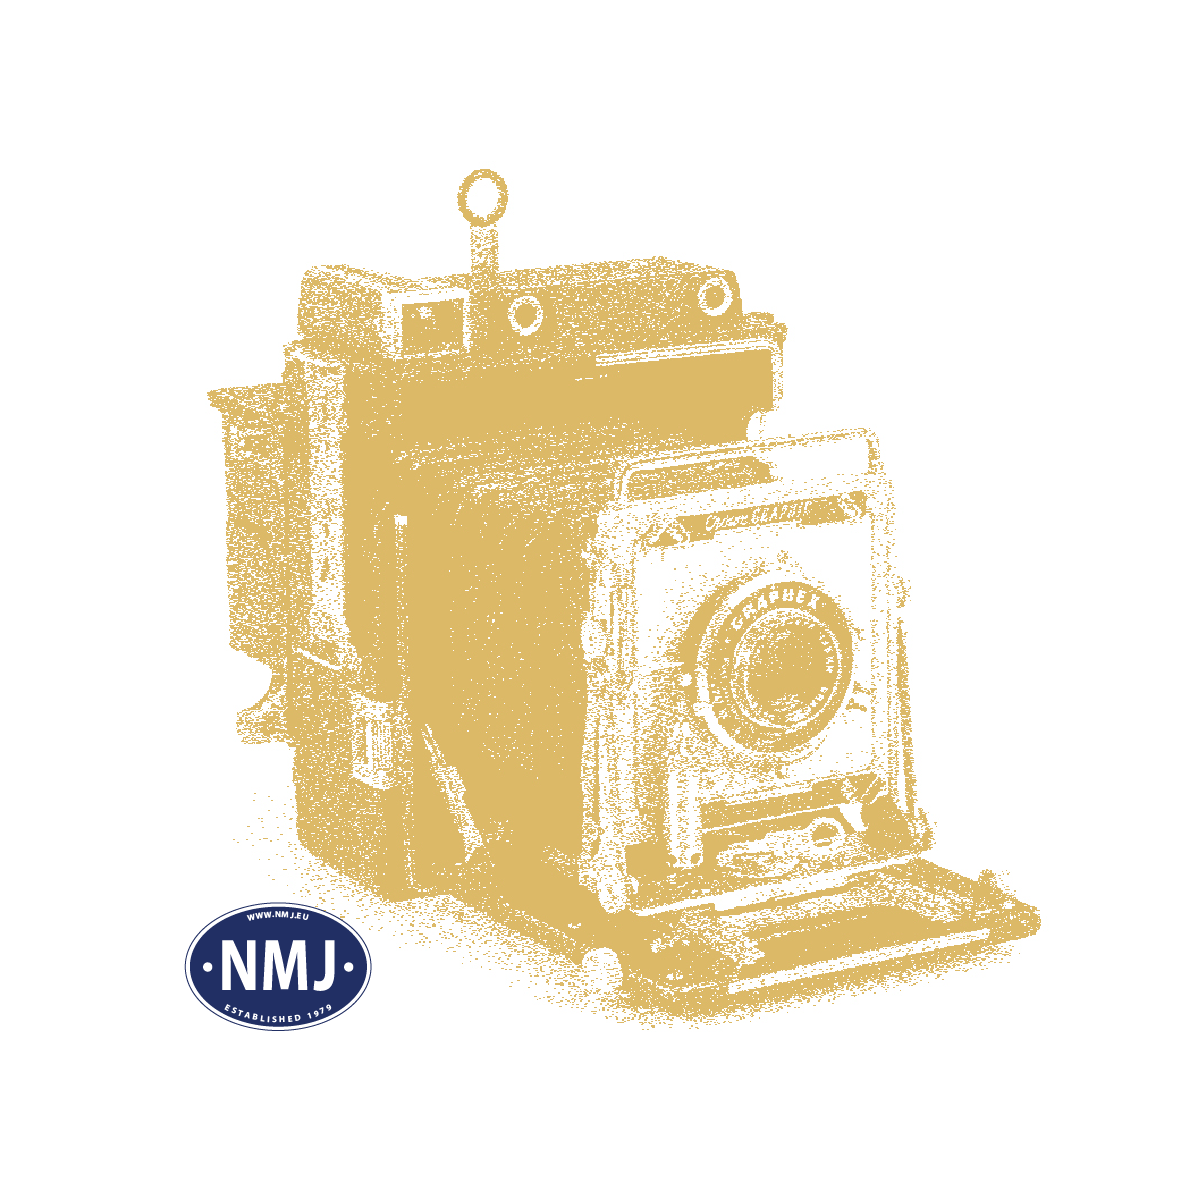 NMJT90202 - NMJ Topline MAV Diesellok  M61.018, DC